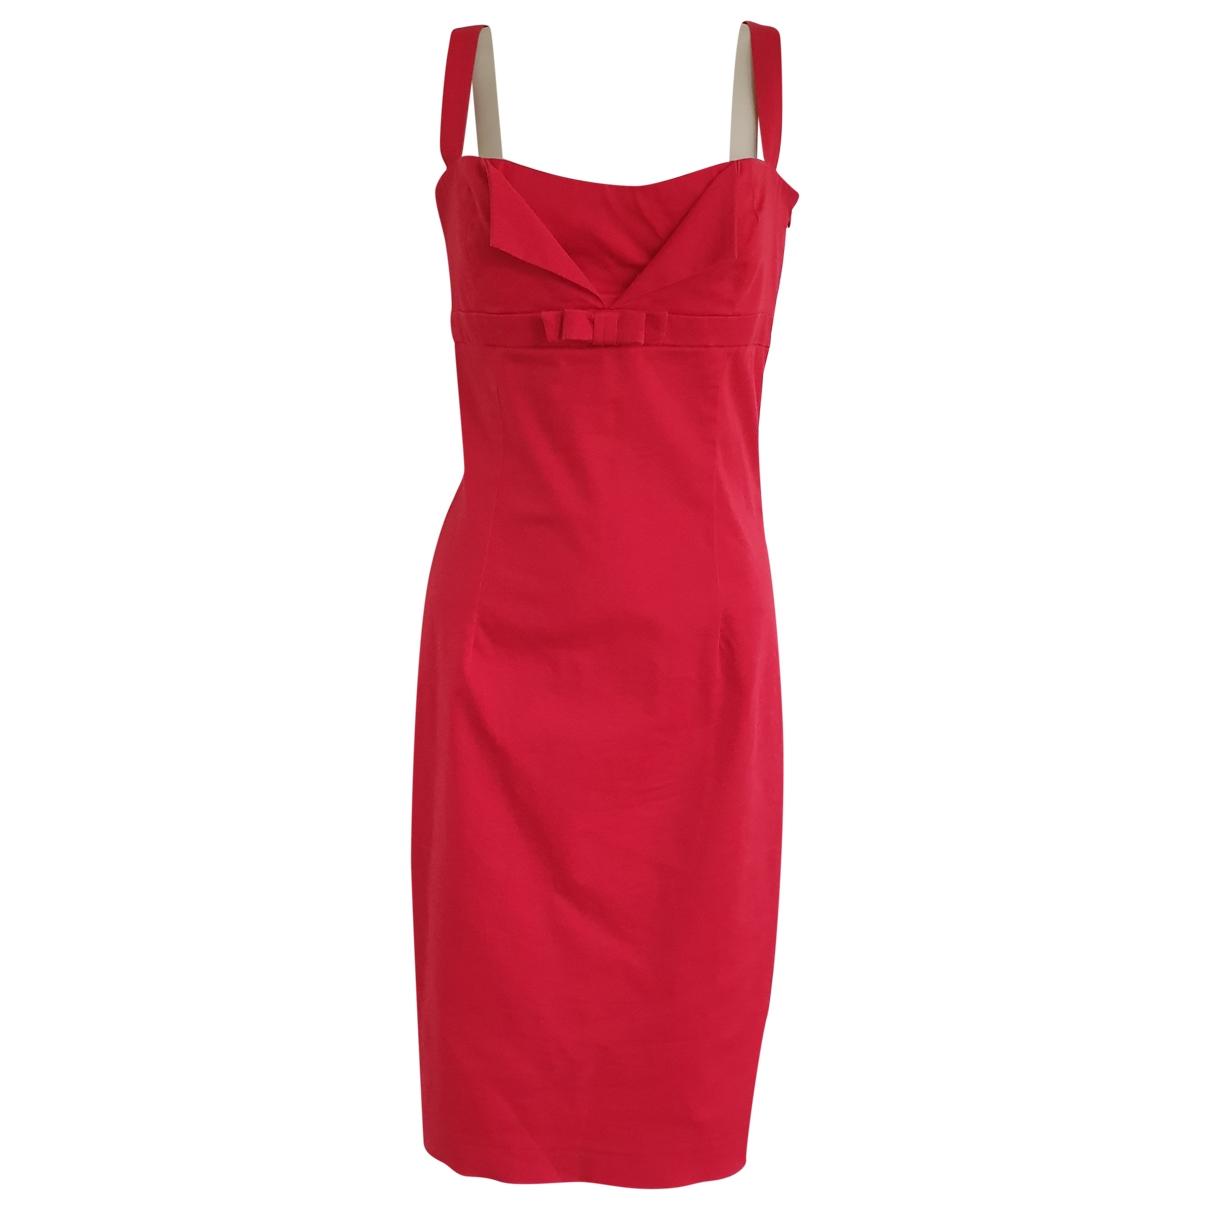 Tara Jarmon \N Red Cotton - elasthane dress for Women 42 FR